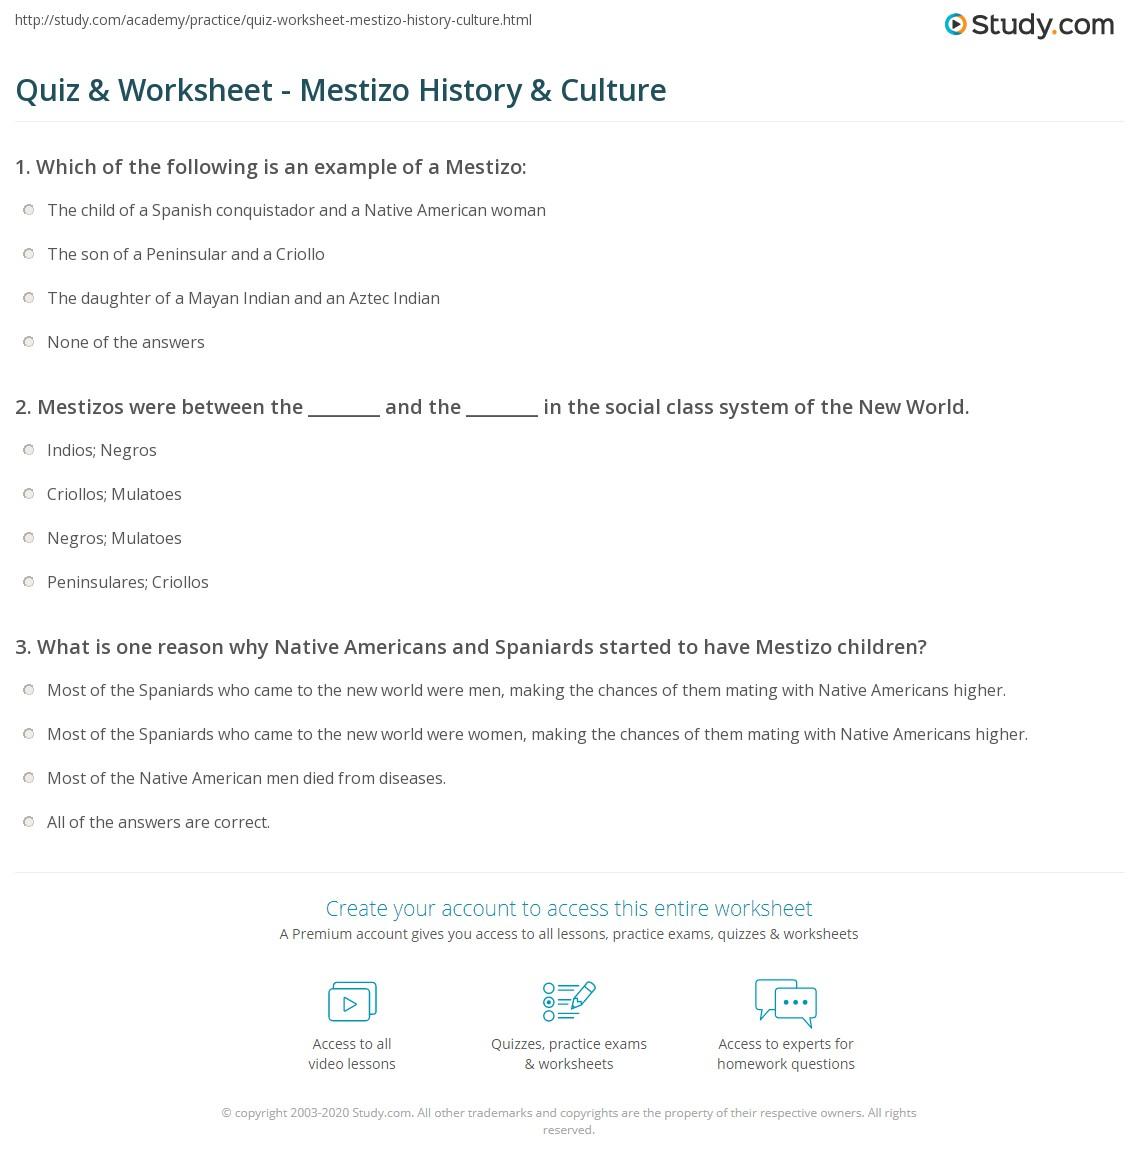 worksheet spanish culture printable worksheets and activities for teachers parents tutors. Black Bedroom Furniture Sets. Home Design Ideas